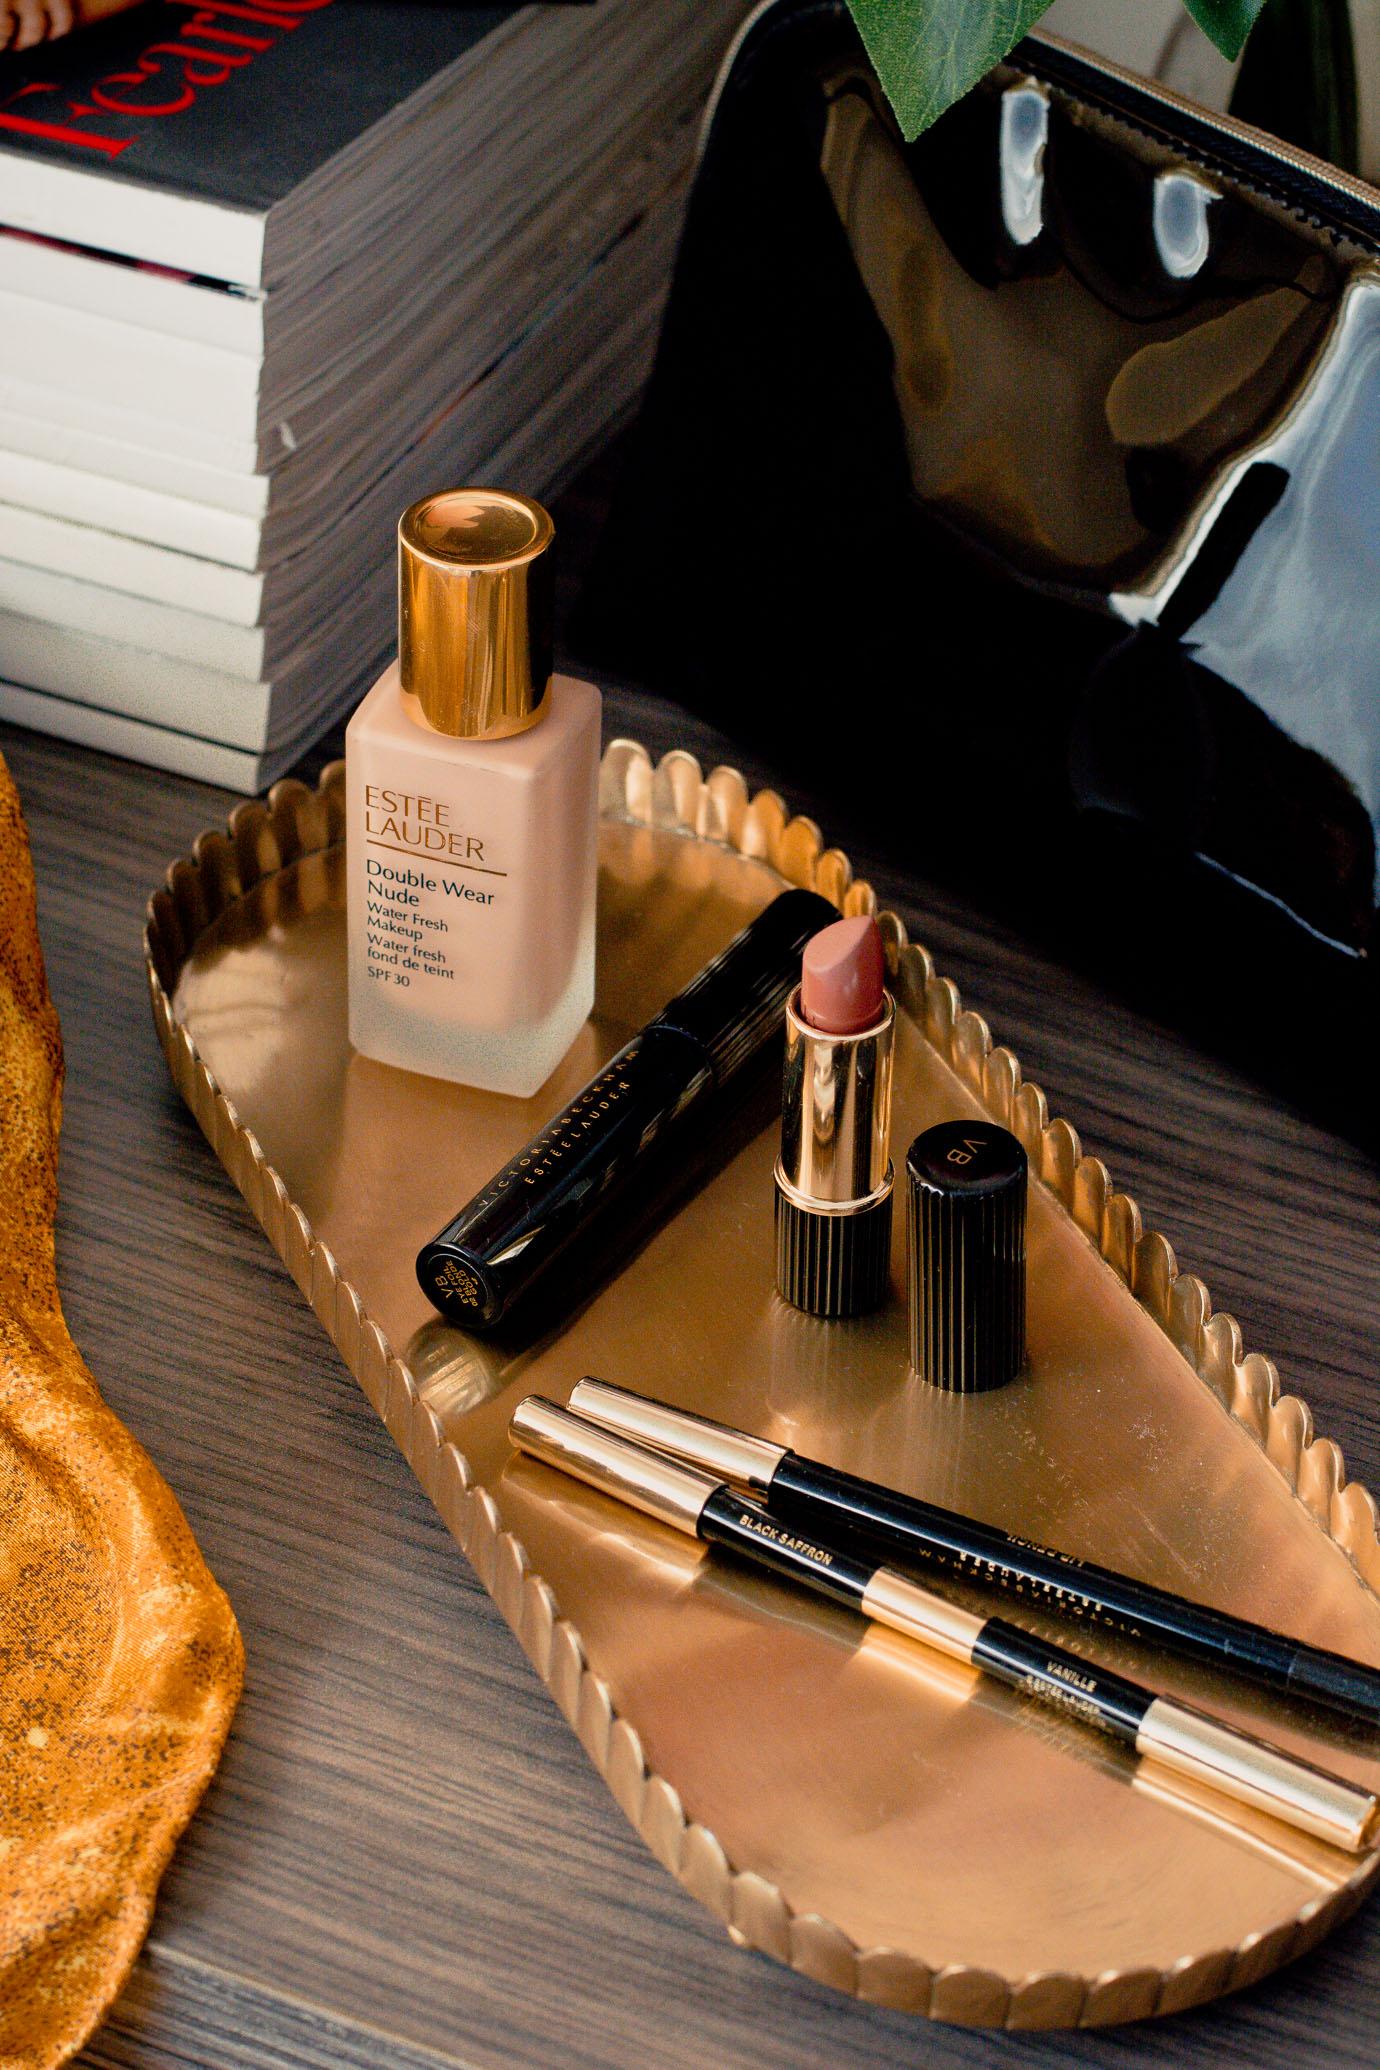 Estee lauder Victoria Beckham beauty collection